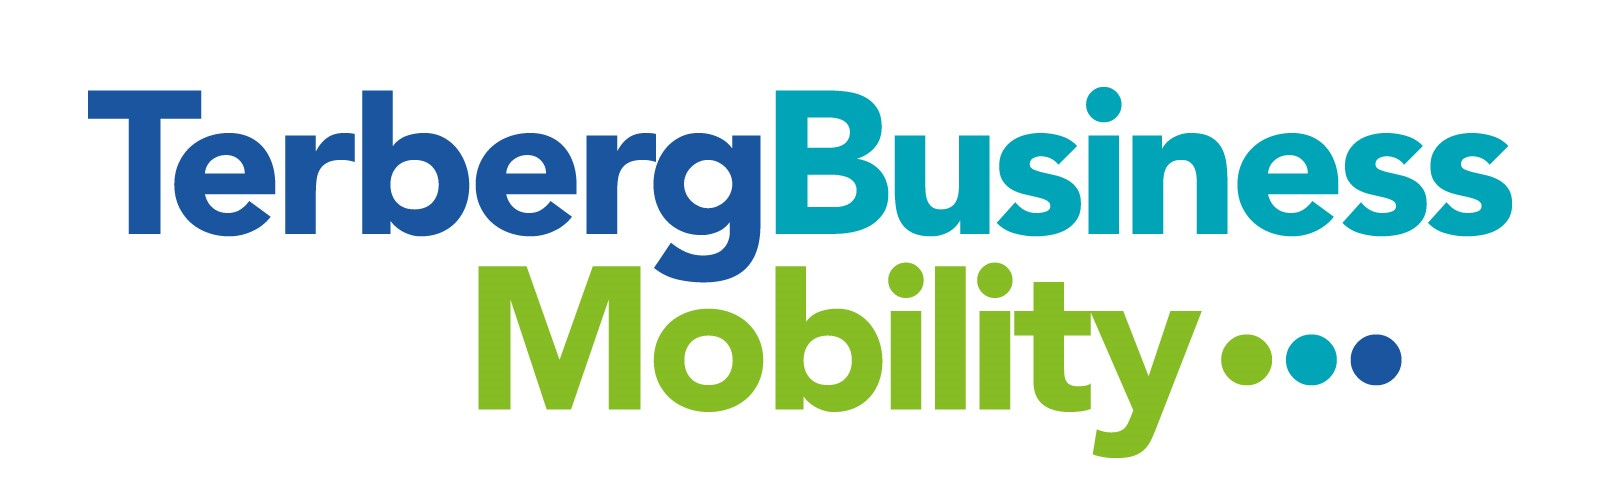 TerbergBusinessMobilty_logo